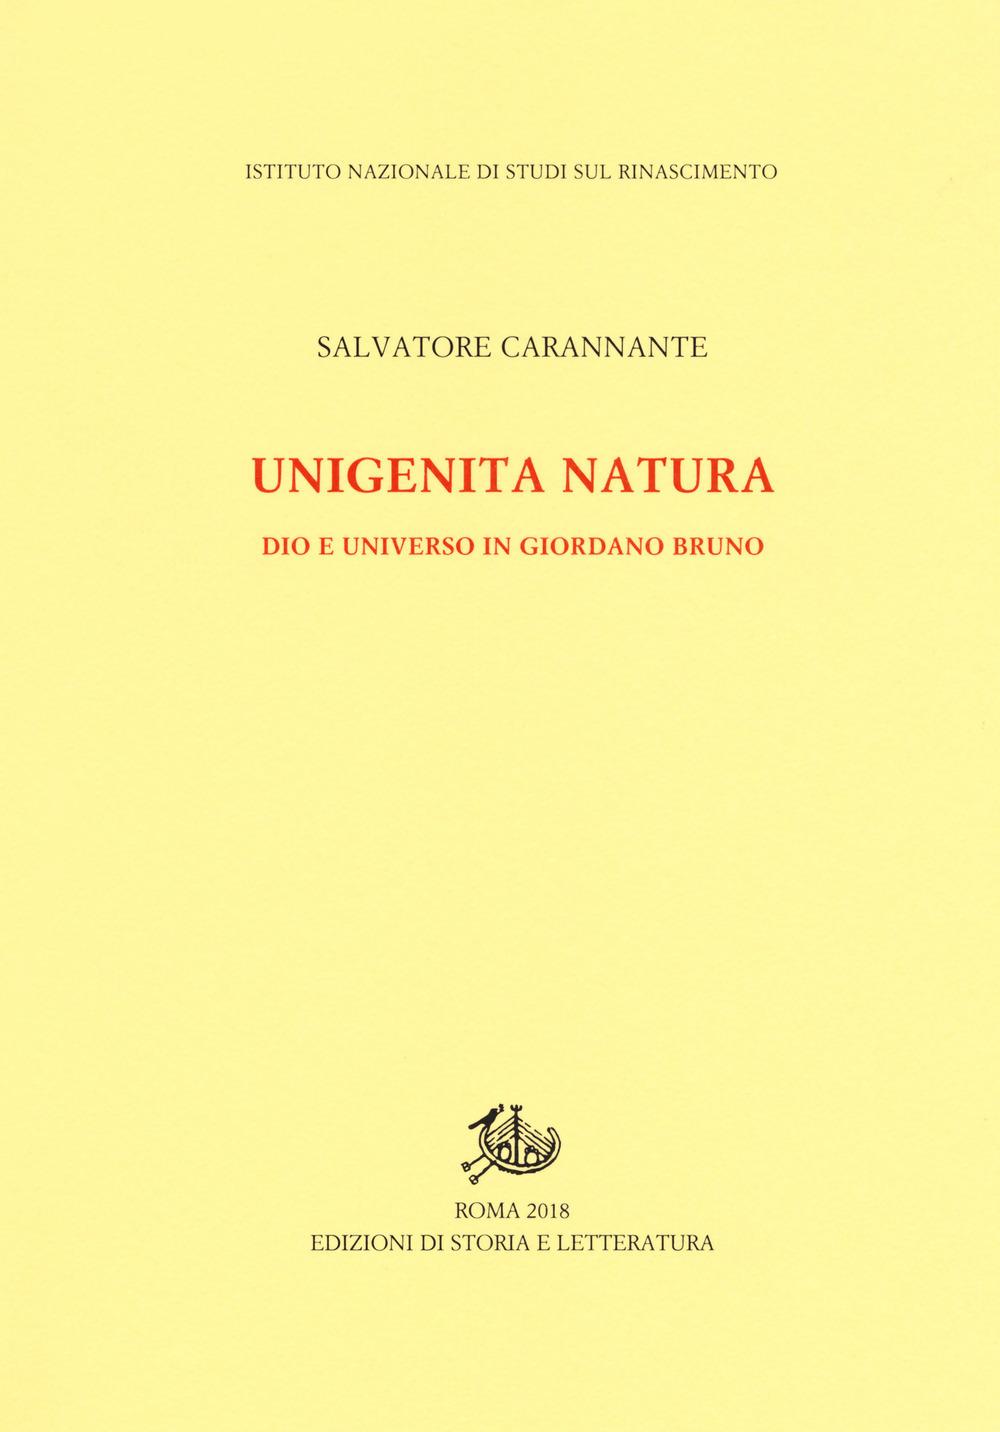 Unigenita natura